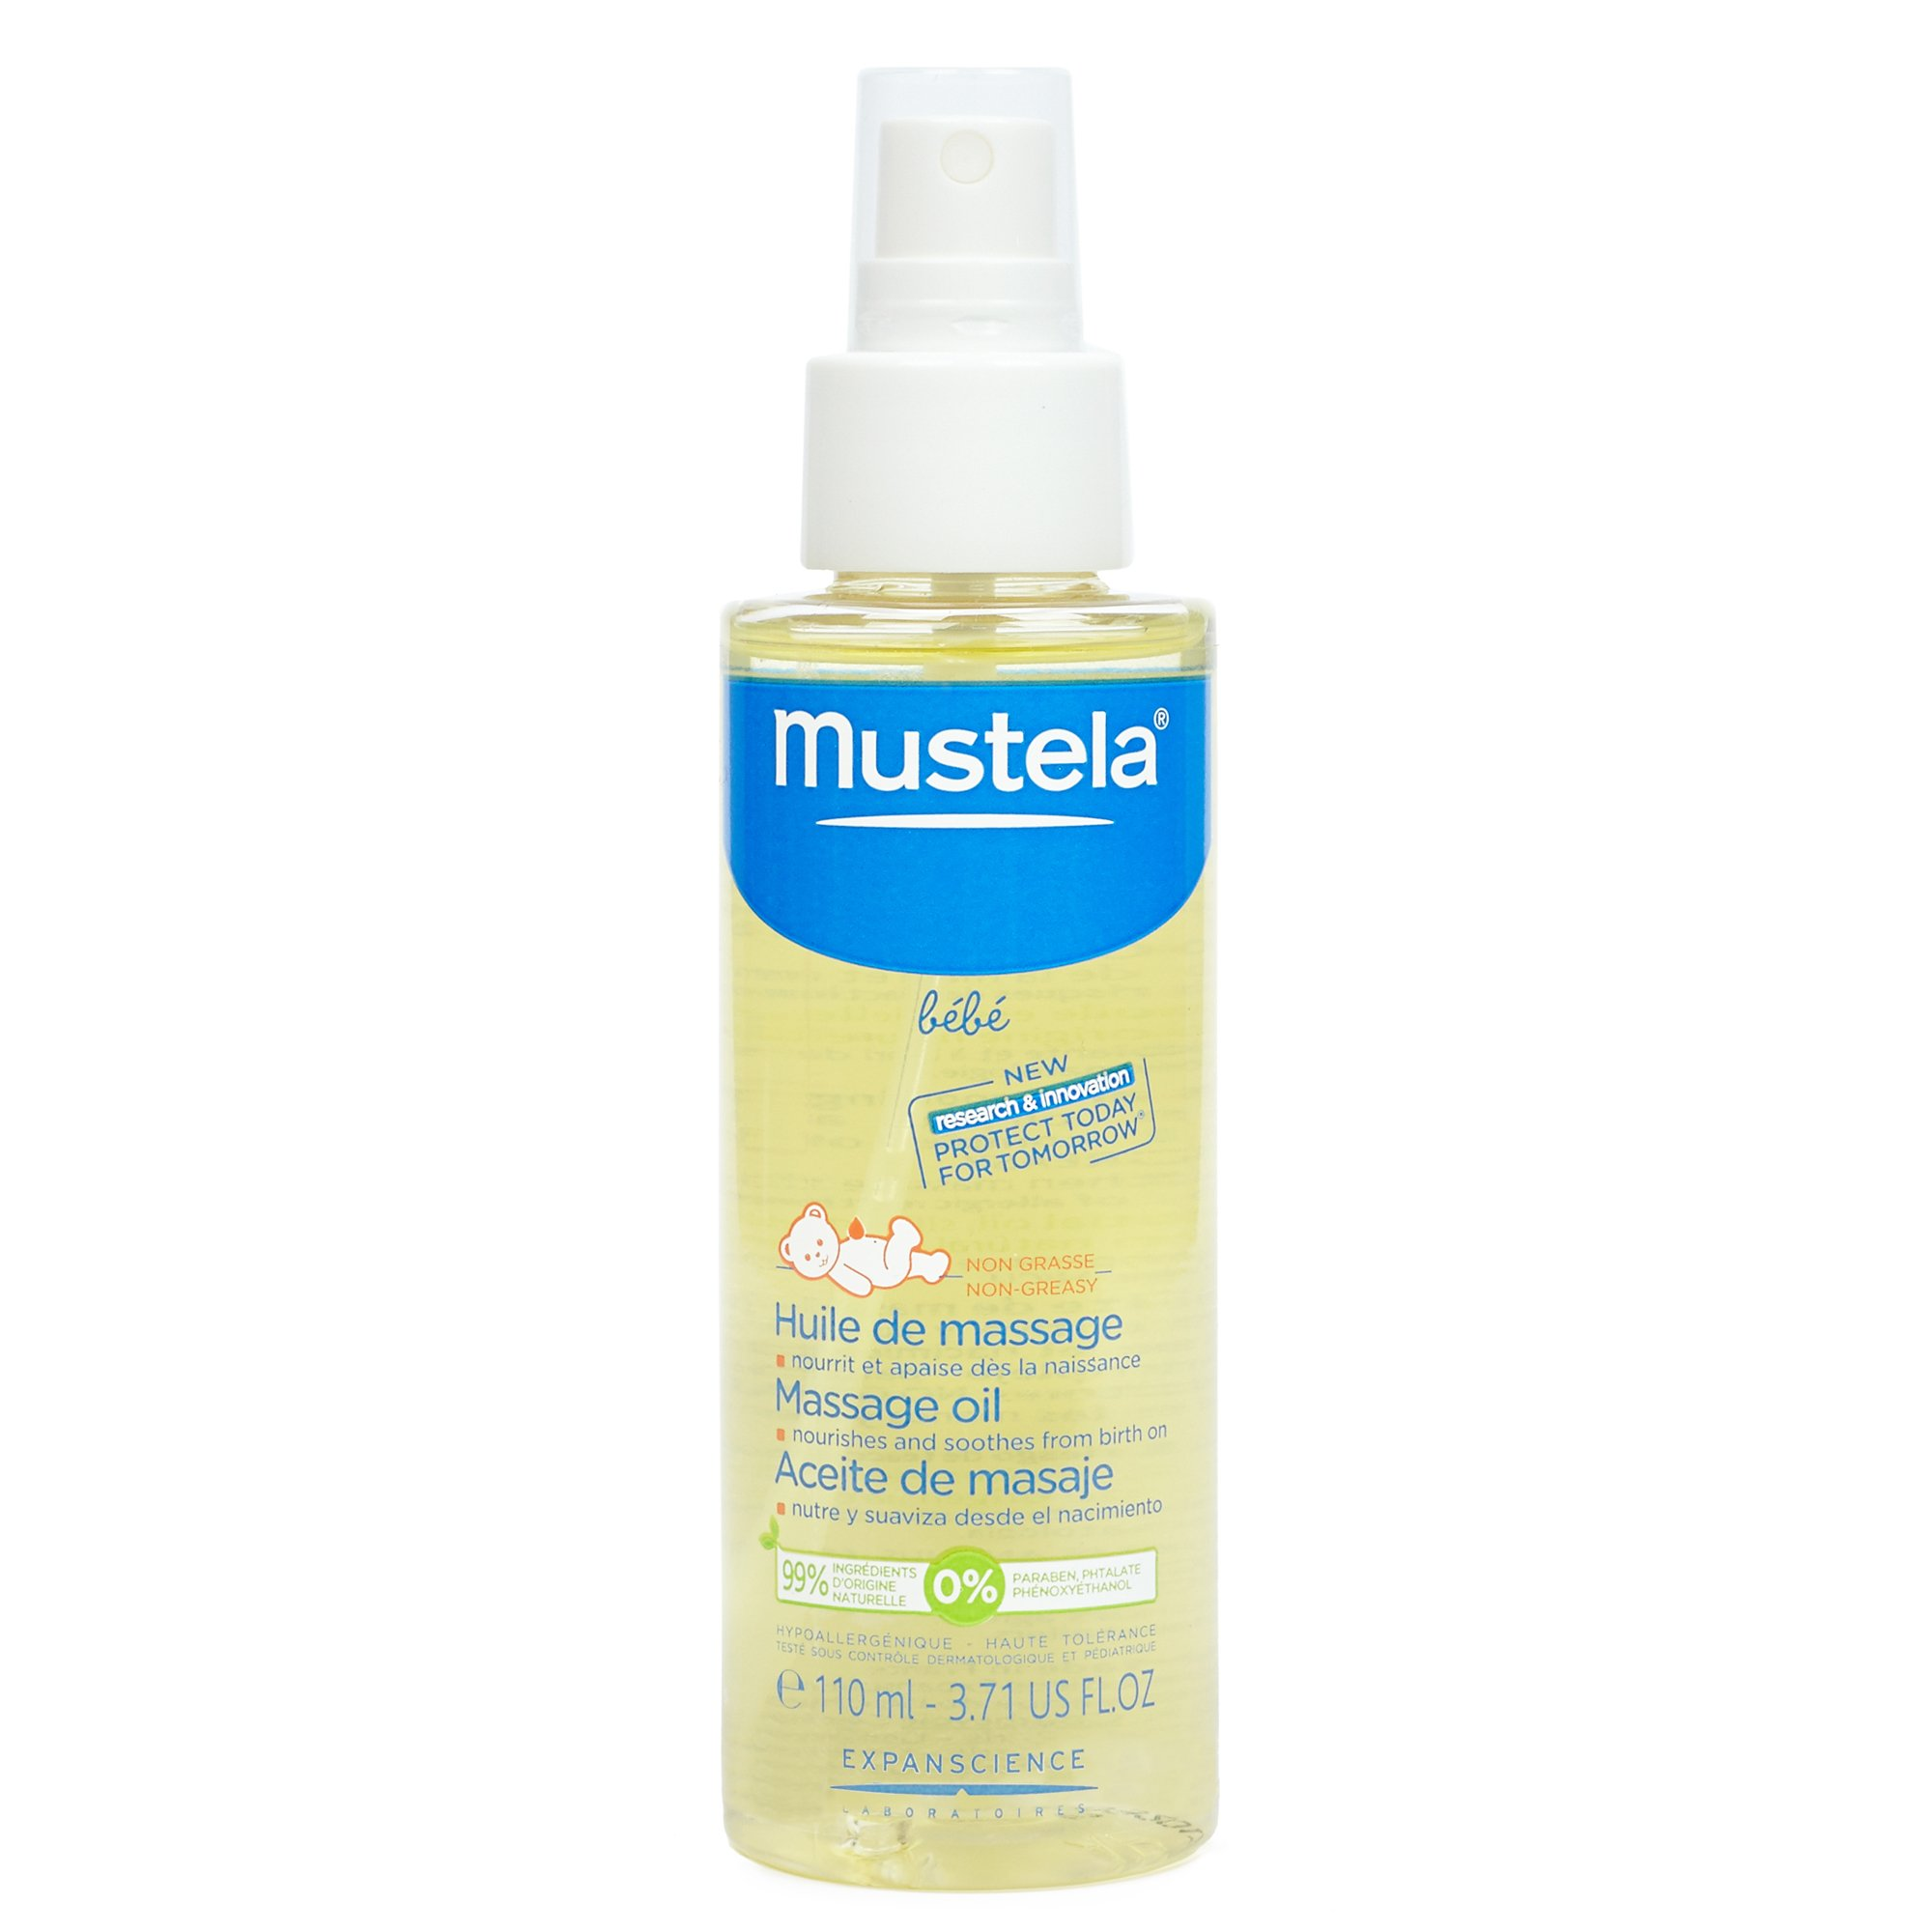 Mustela Baby Oil, Moisturizing Oil for Baby Massage, Natural Avocado Oil, Pomegranate & Sunflower Seed Oil